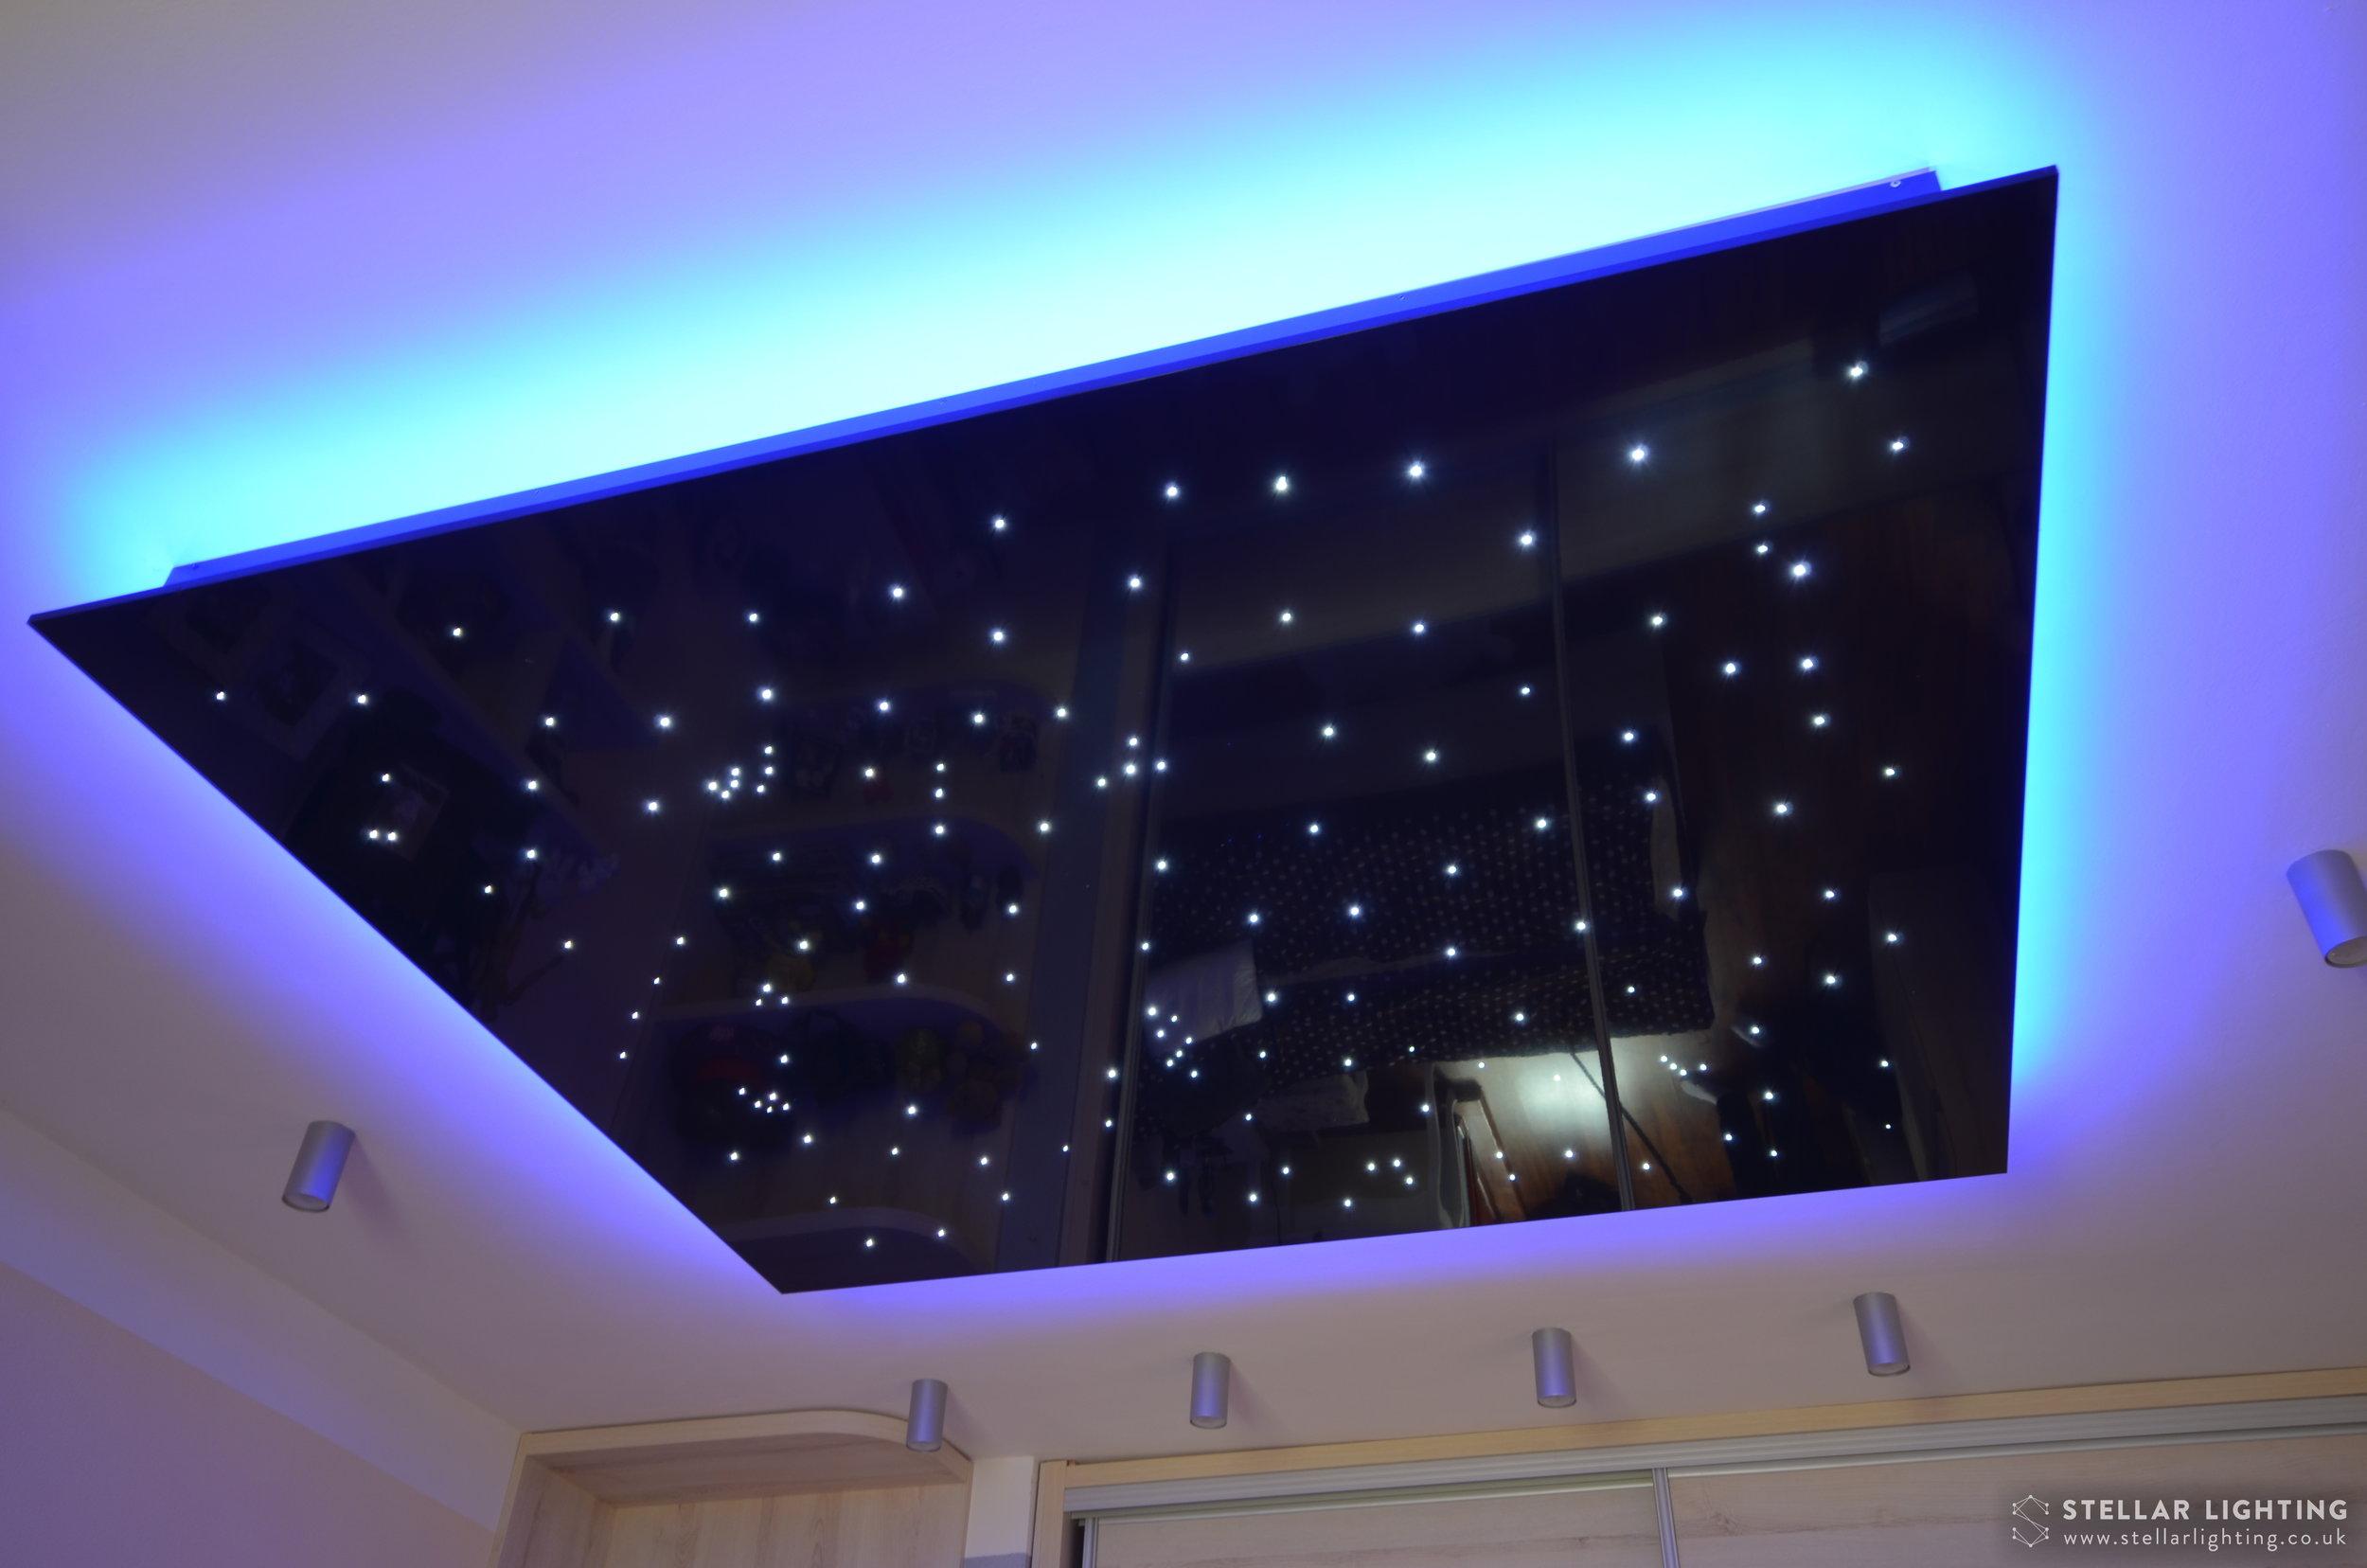 Fibre optic star ceiling with blue edge lighting